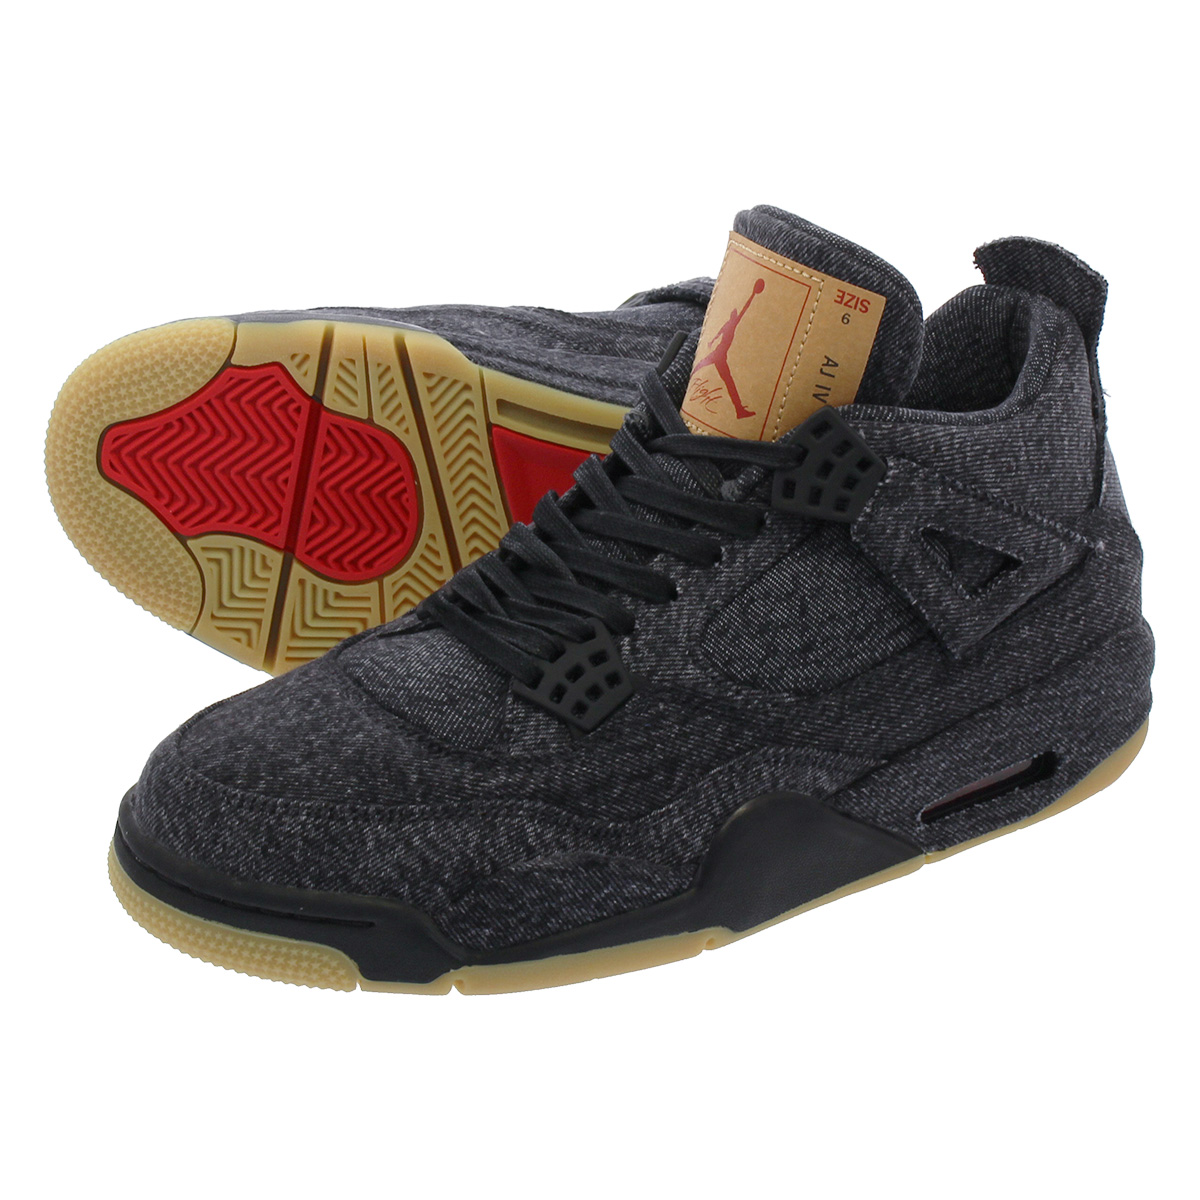 quality design 5966a d315d NIKE AIR JORDAN 4 RETRO NRG Nike air Jordan 4 nostalgic NRG Levis BLACK BLACK  ao2571-001